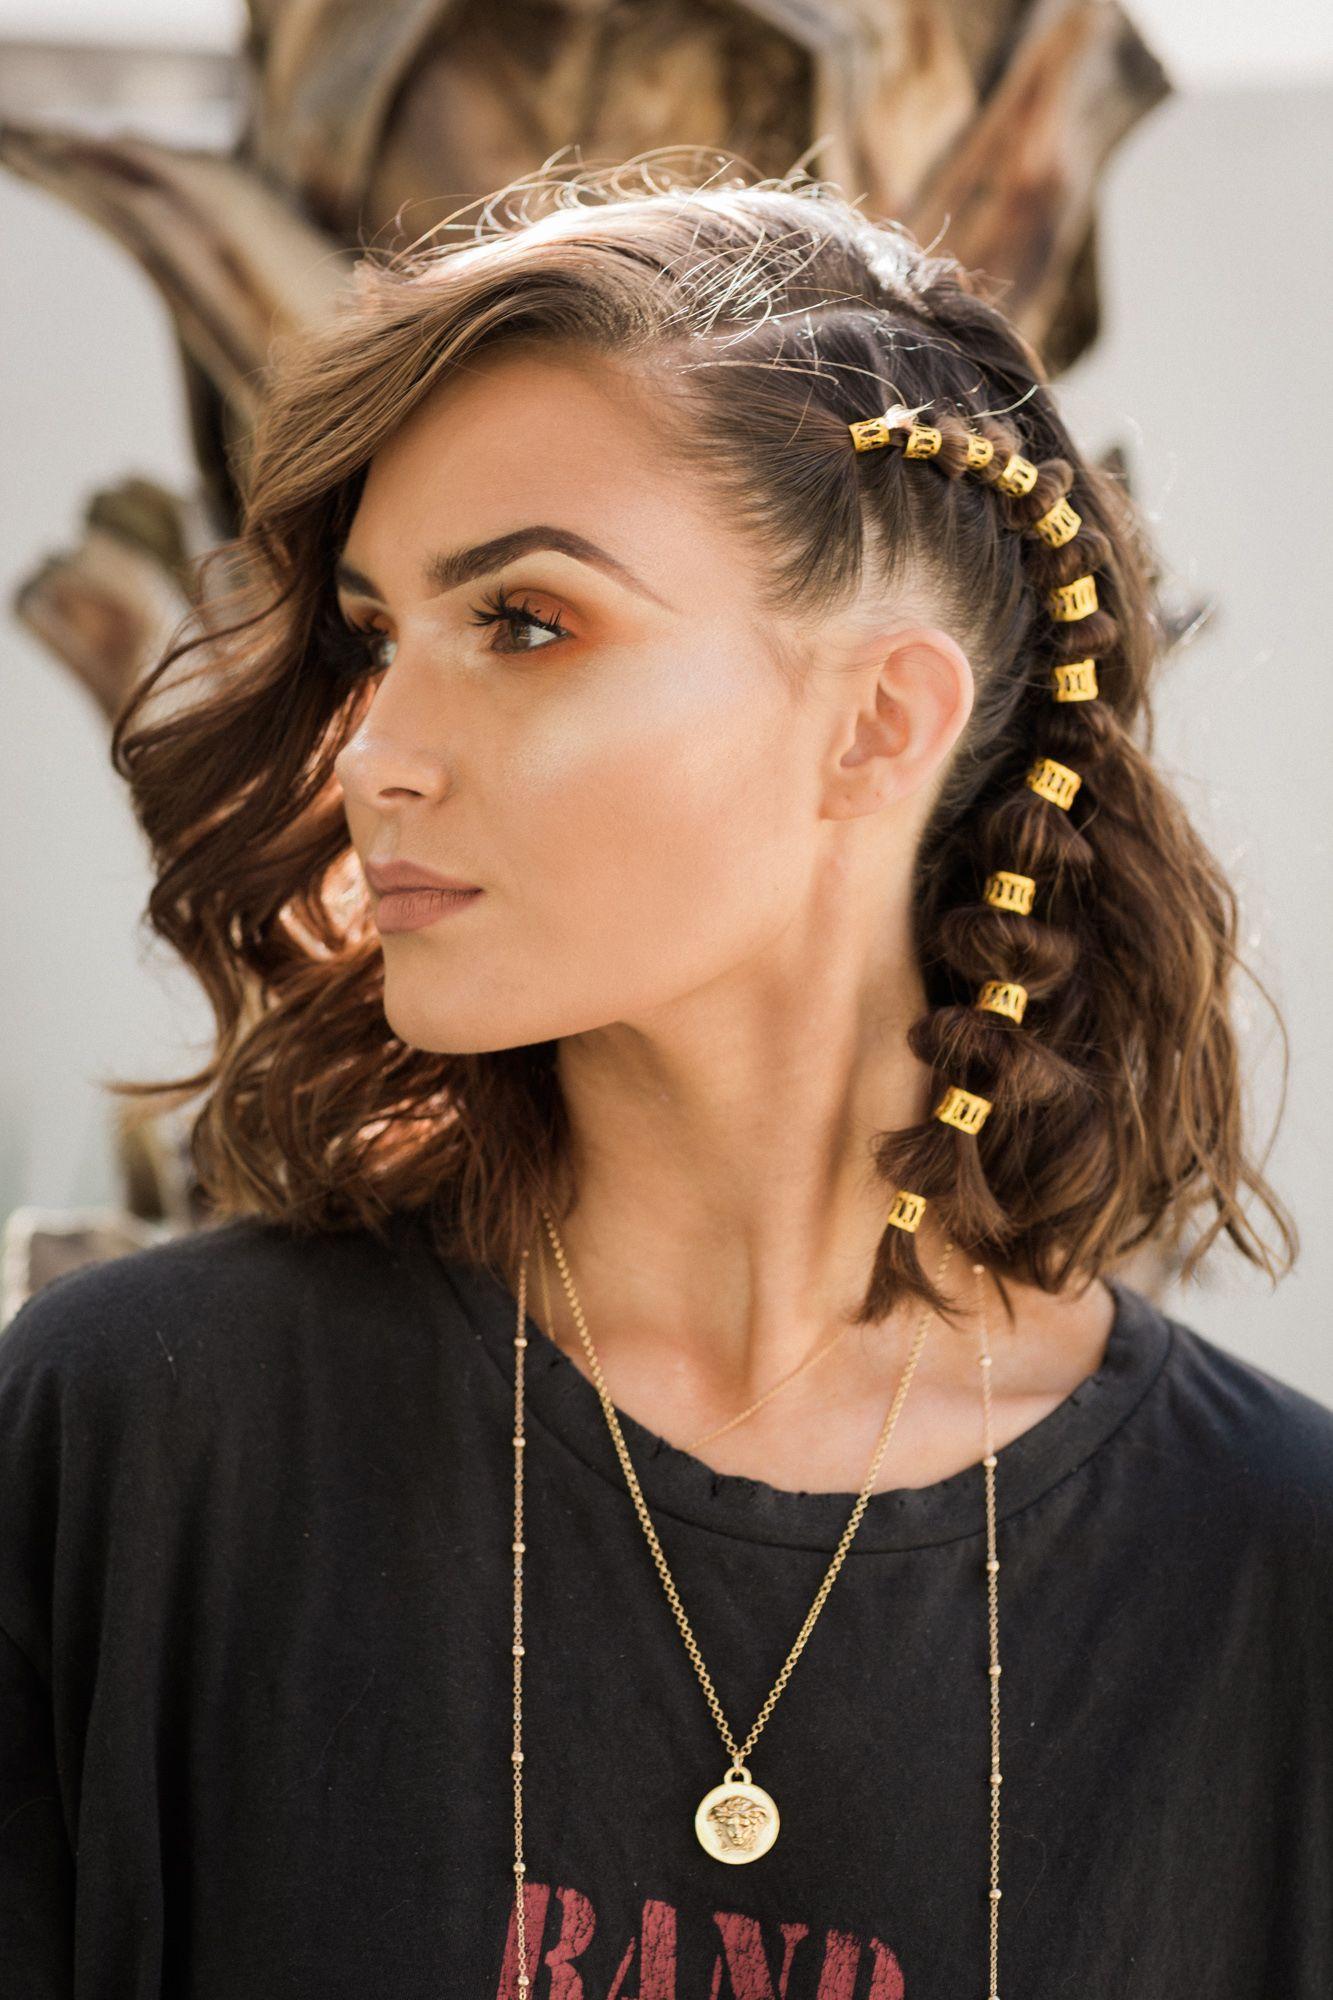 Photo of Les coiffures de festival | Inspiration coiffure ghd